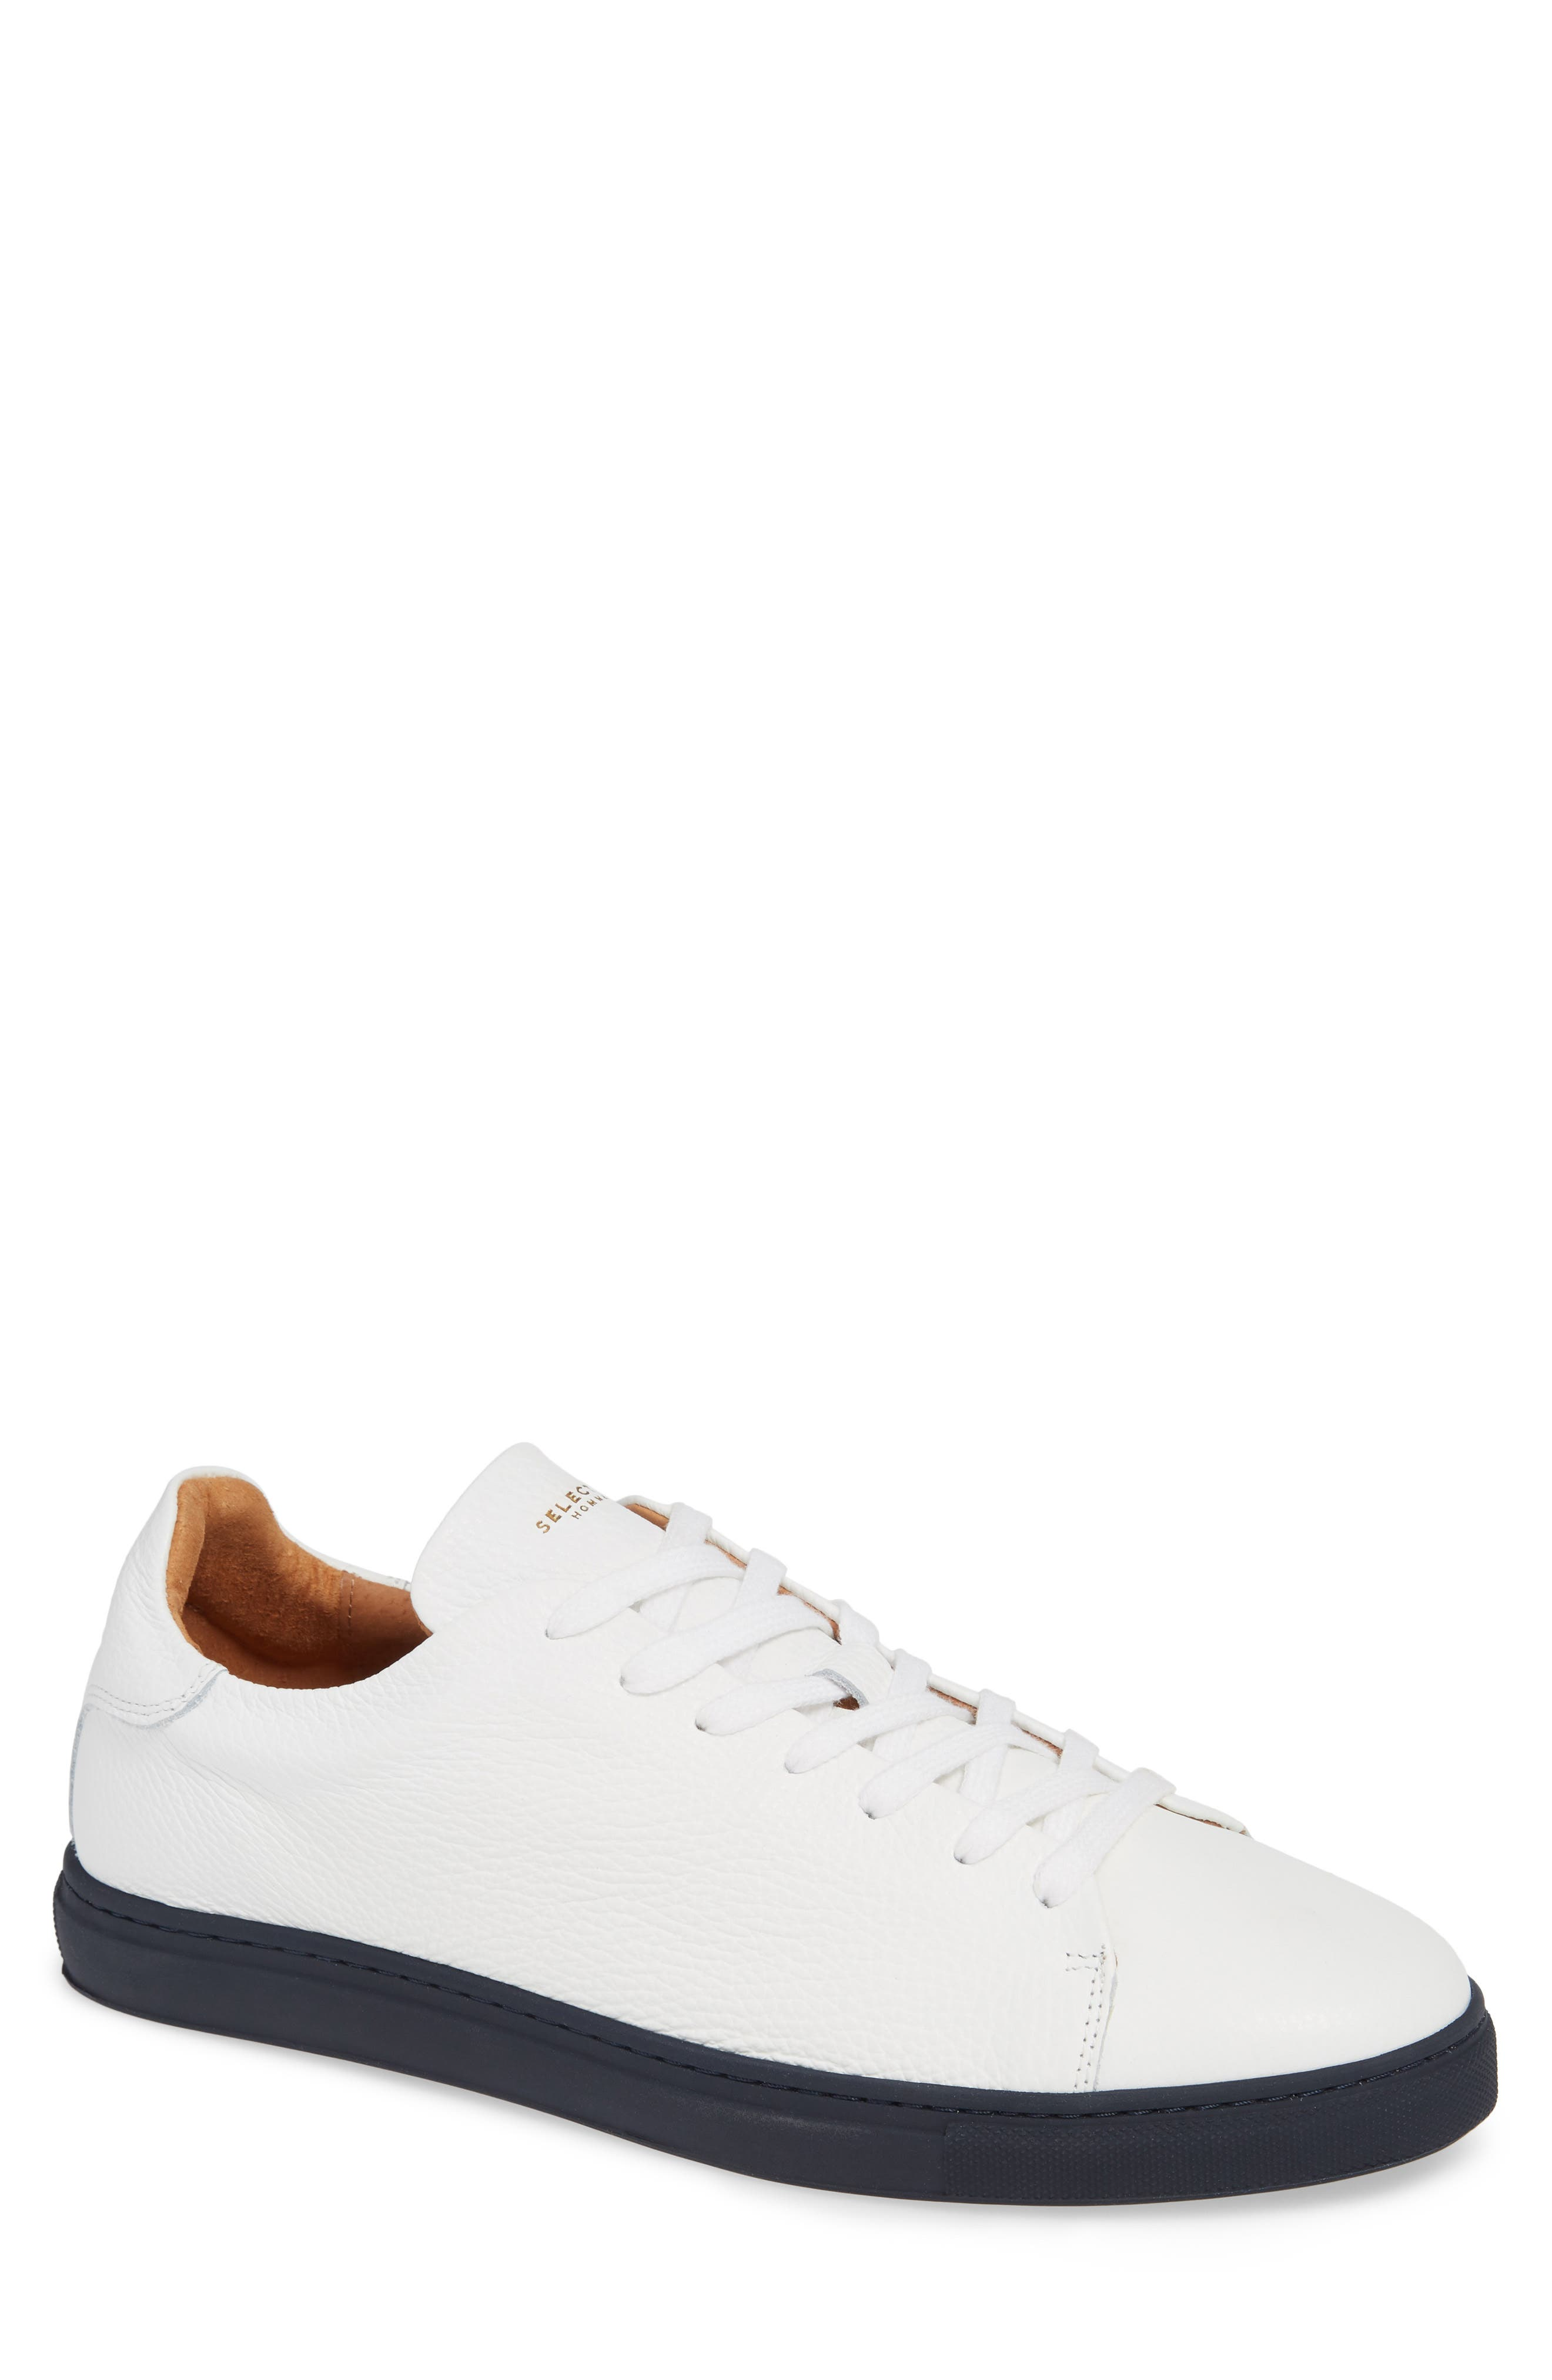 David Sneaker,                             Main thumbnail 1, color,                             WHITE/ DARK NAVY SOLE